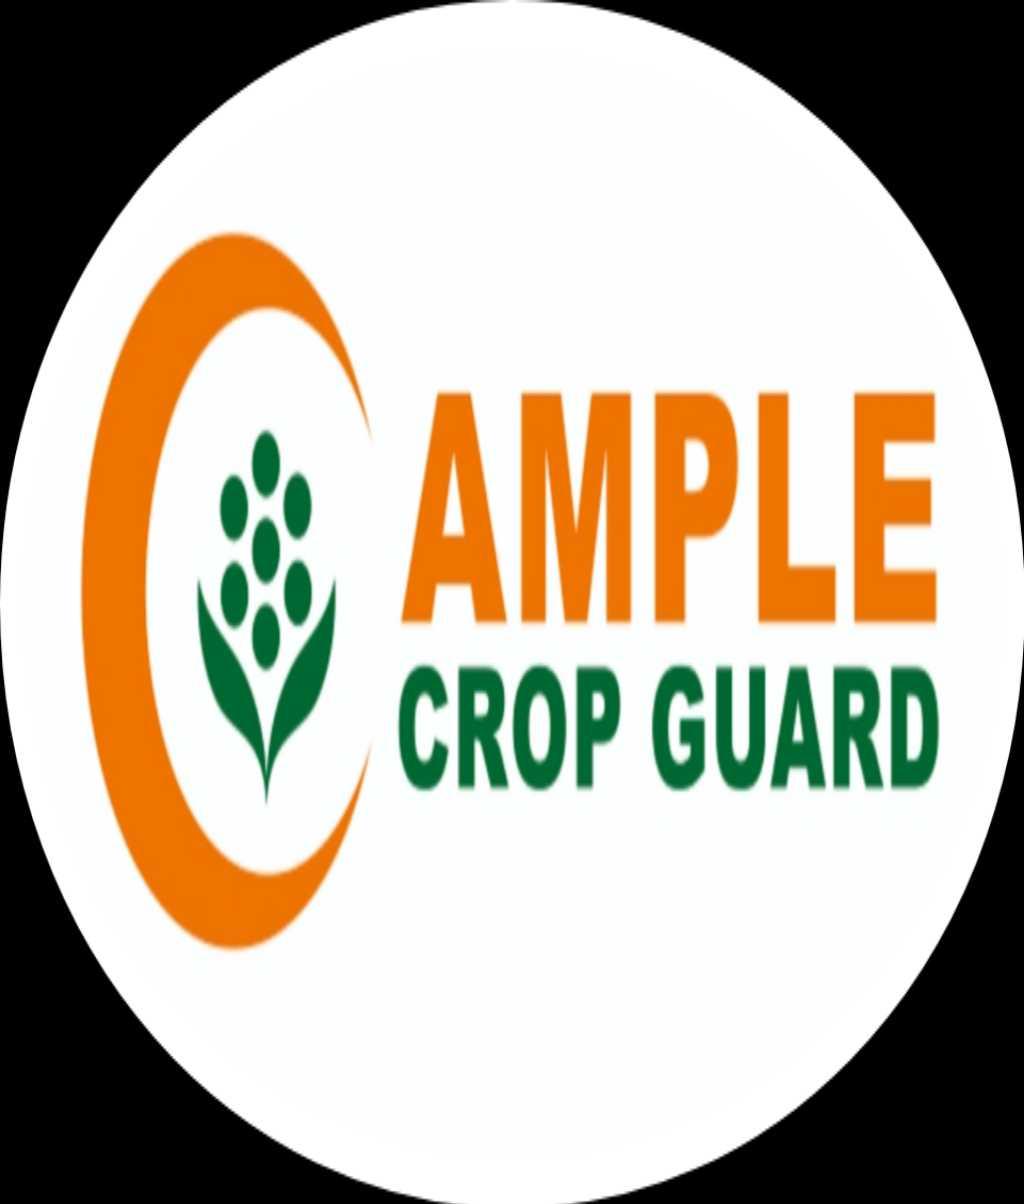 AMPLE CROP GUARD